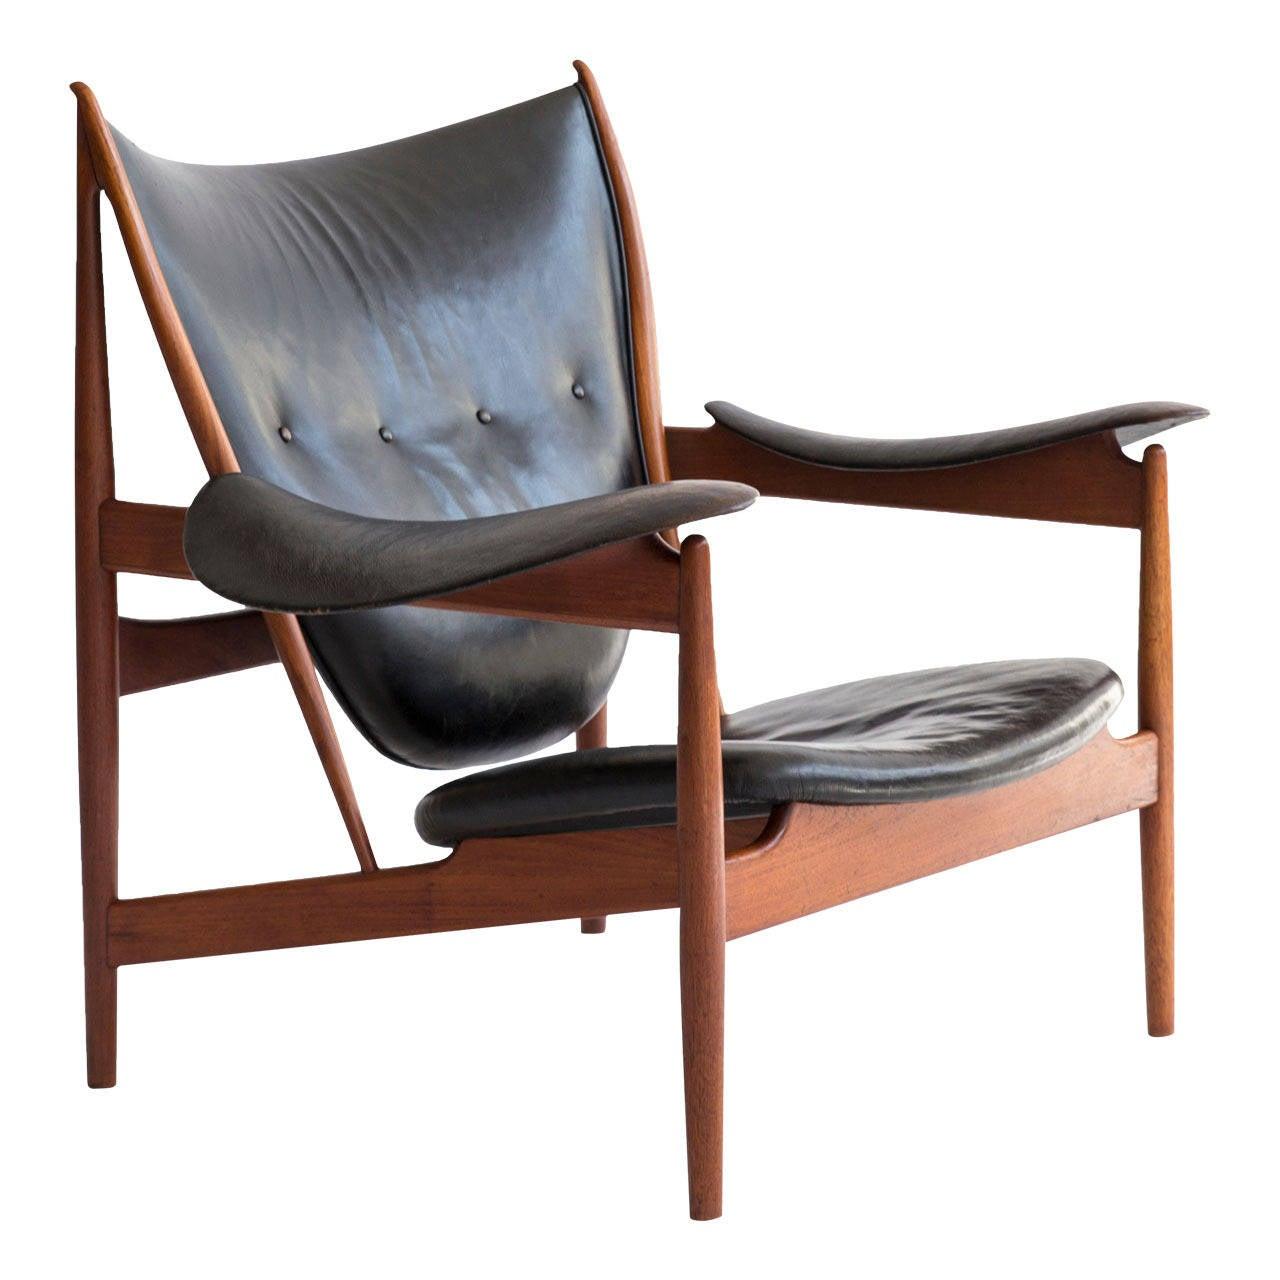 Early Finn Juhl Chieftain Chair, Niels Vodder For Sale